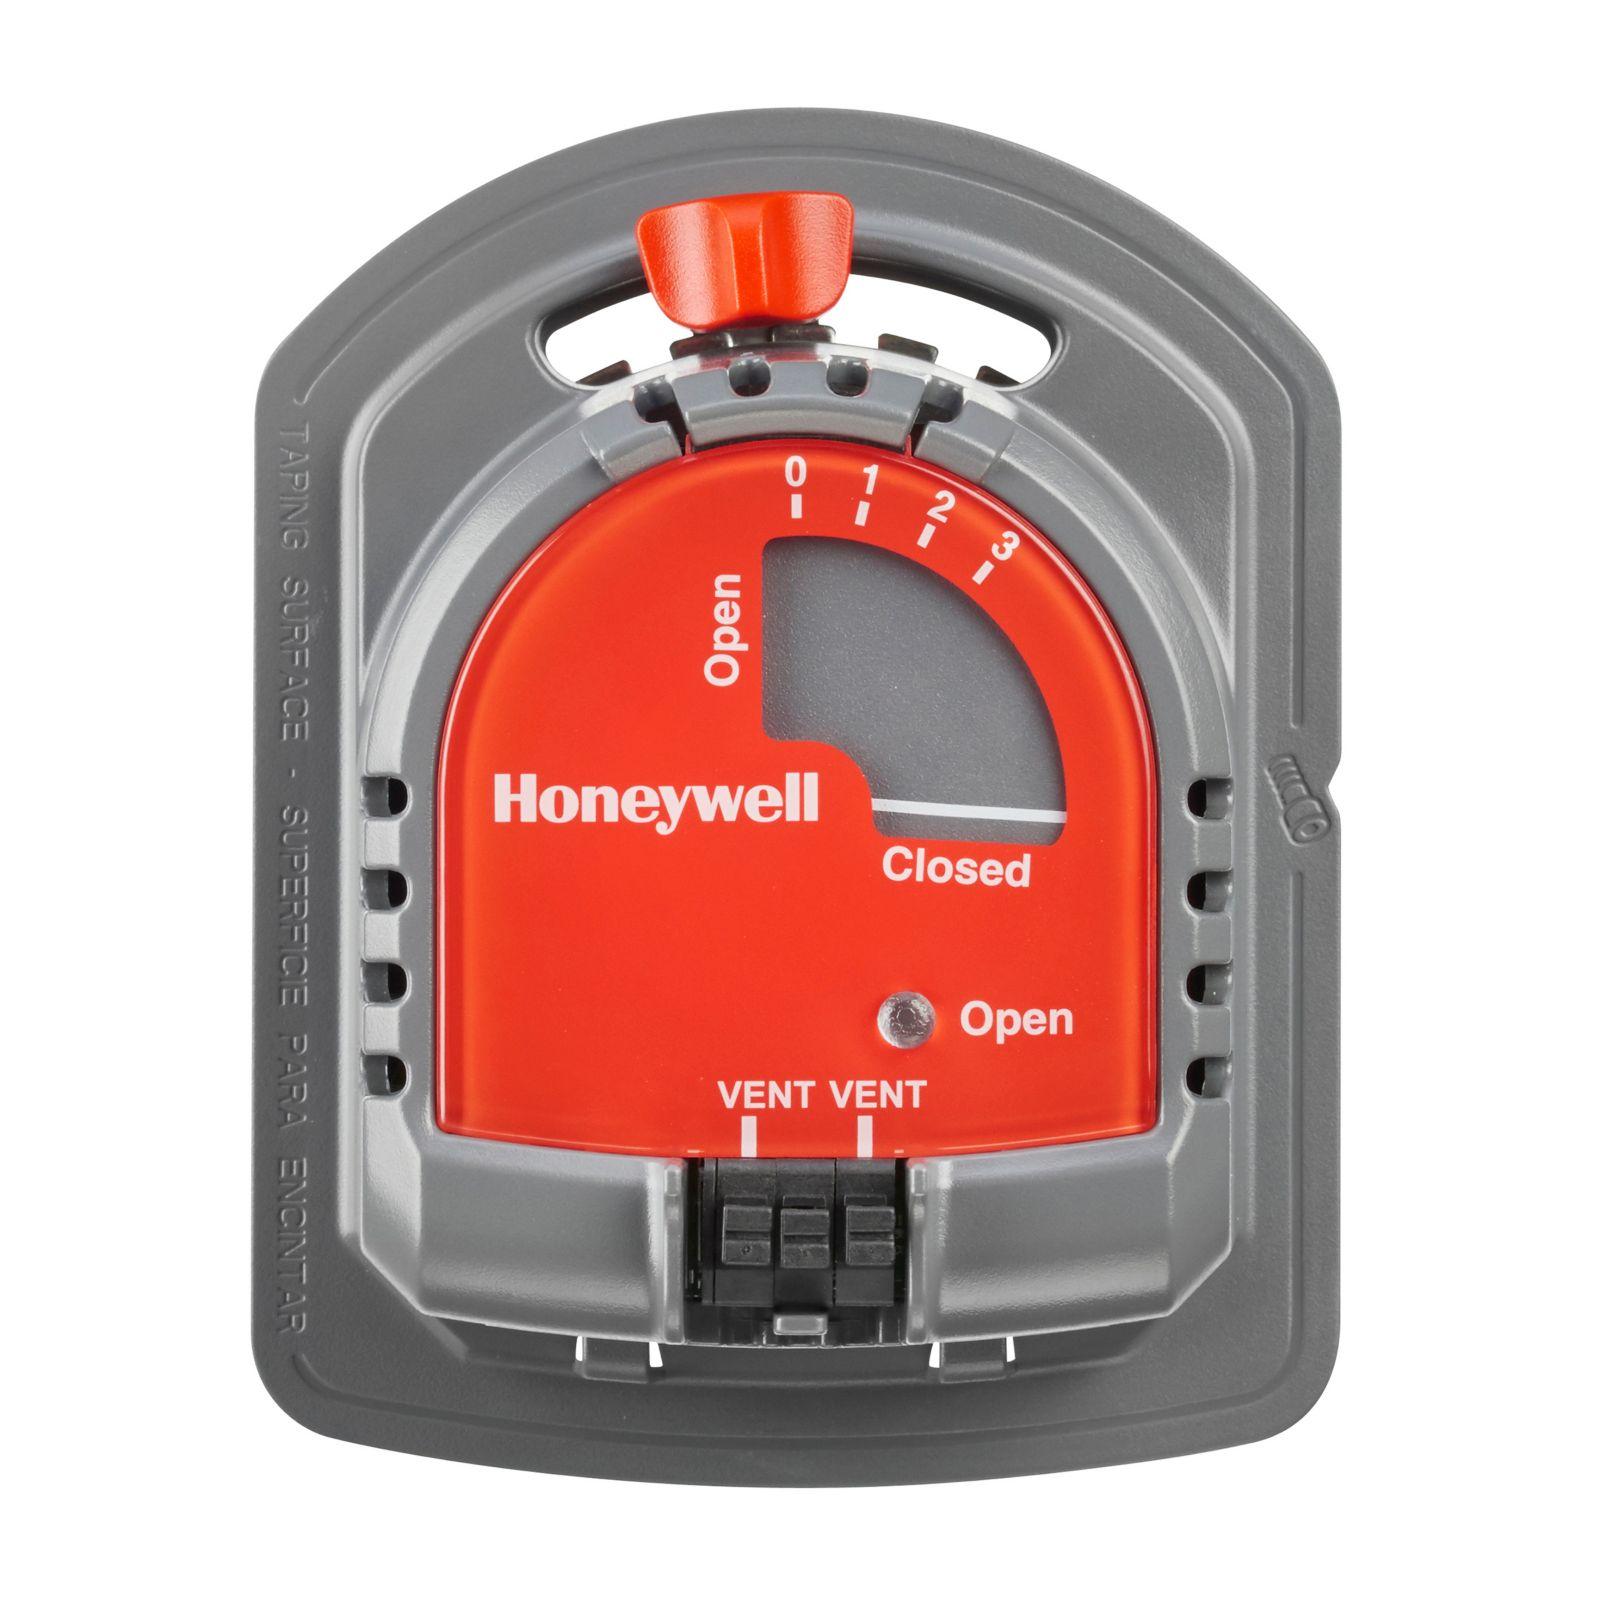 Honeywell Zone Damper Wiring Diagram